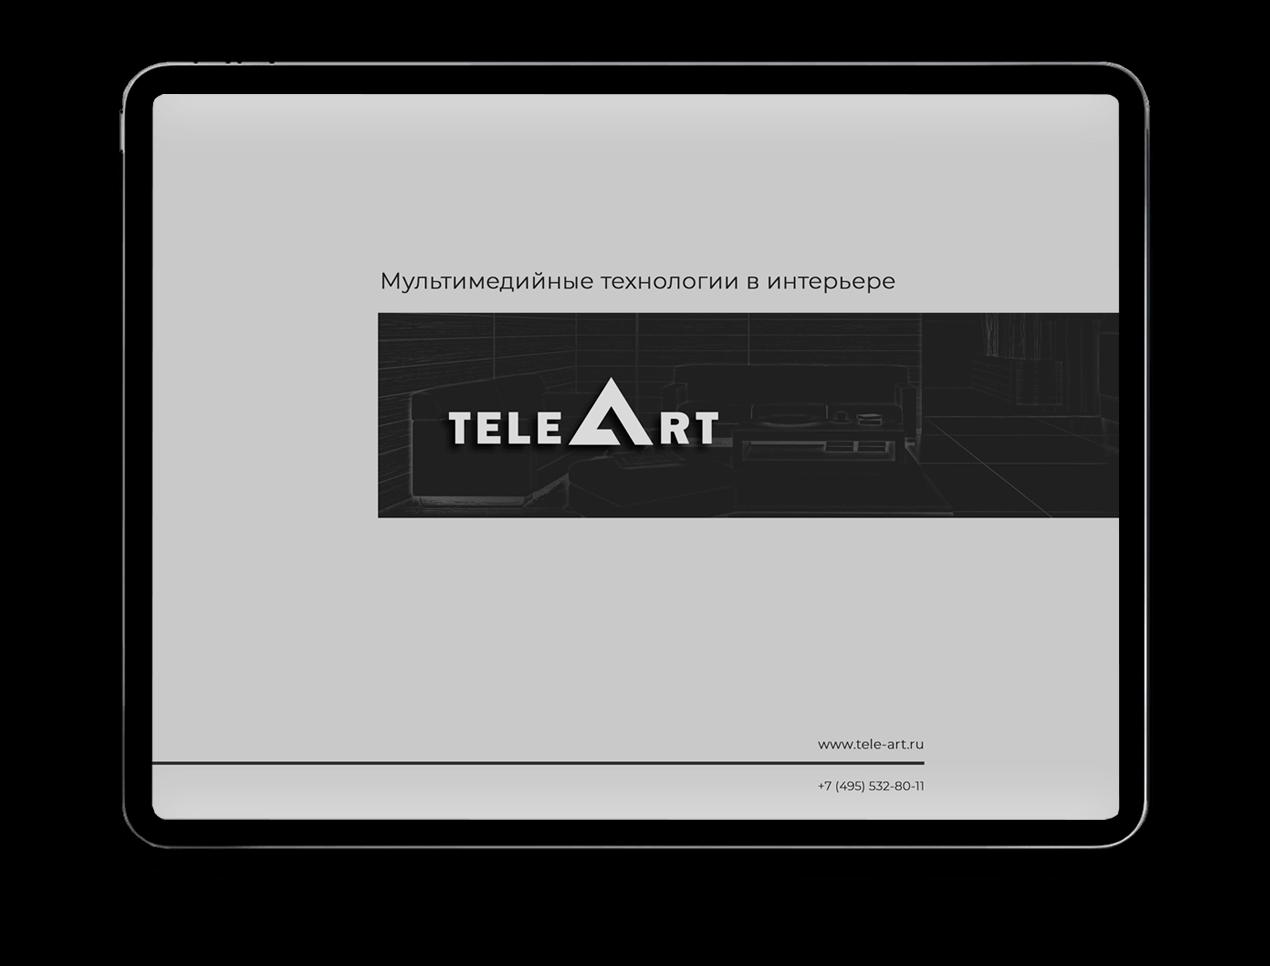 KATALOG Tele-Art